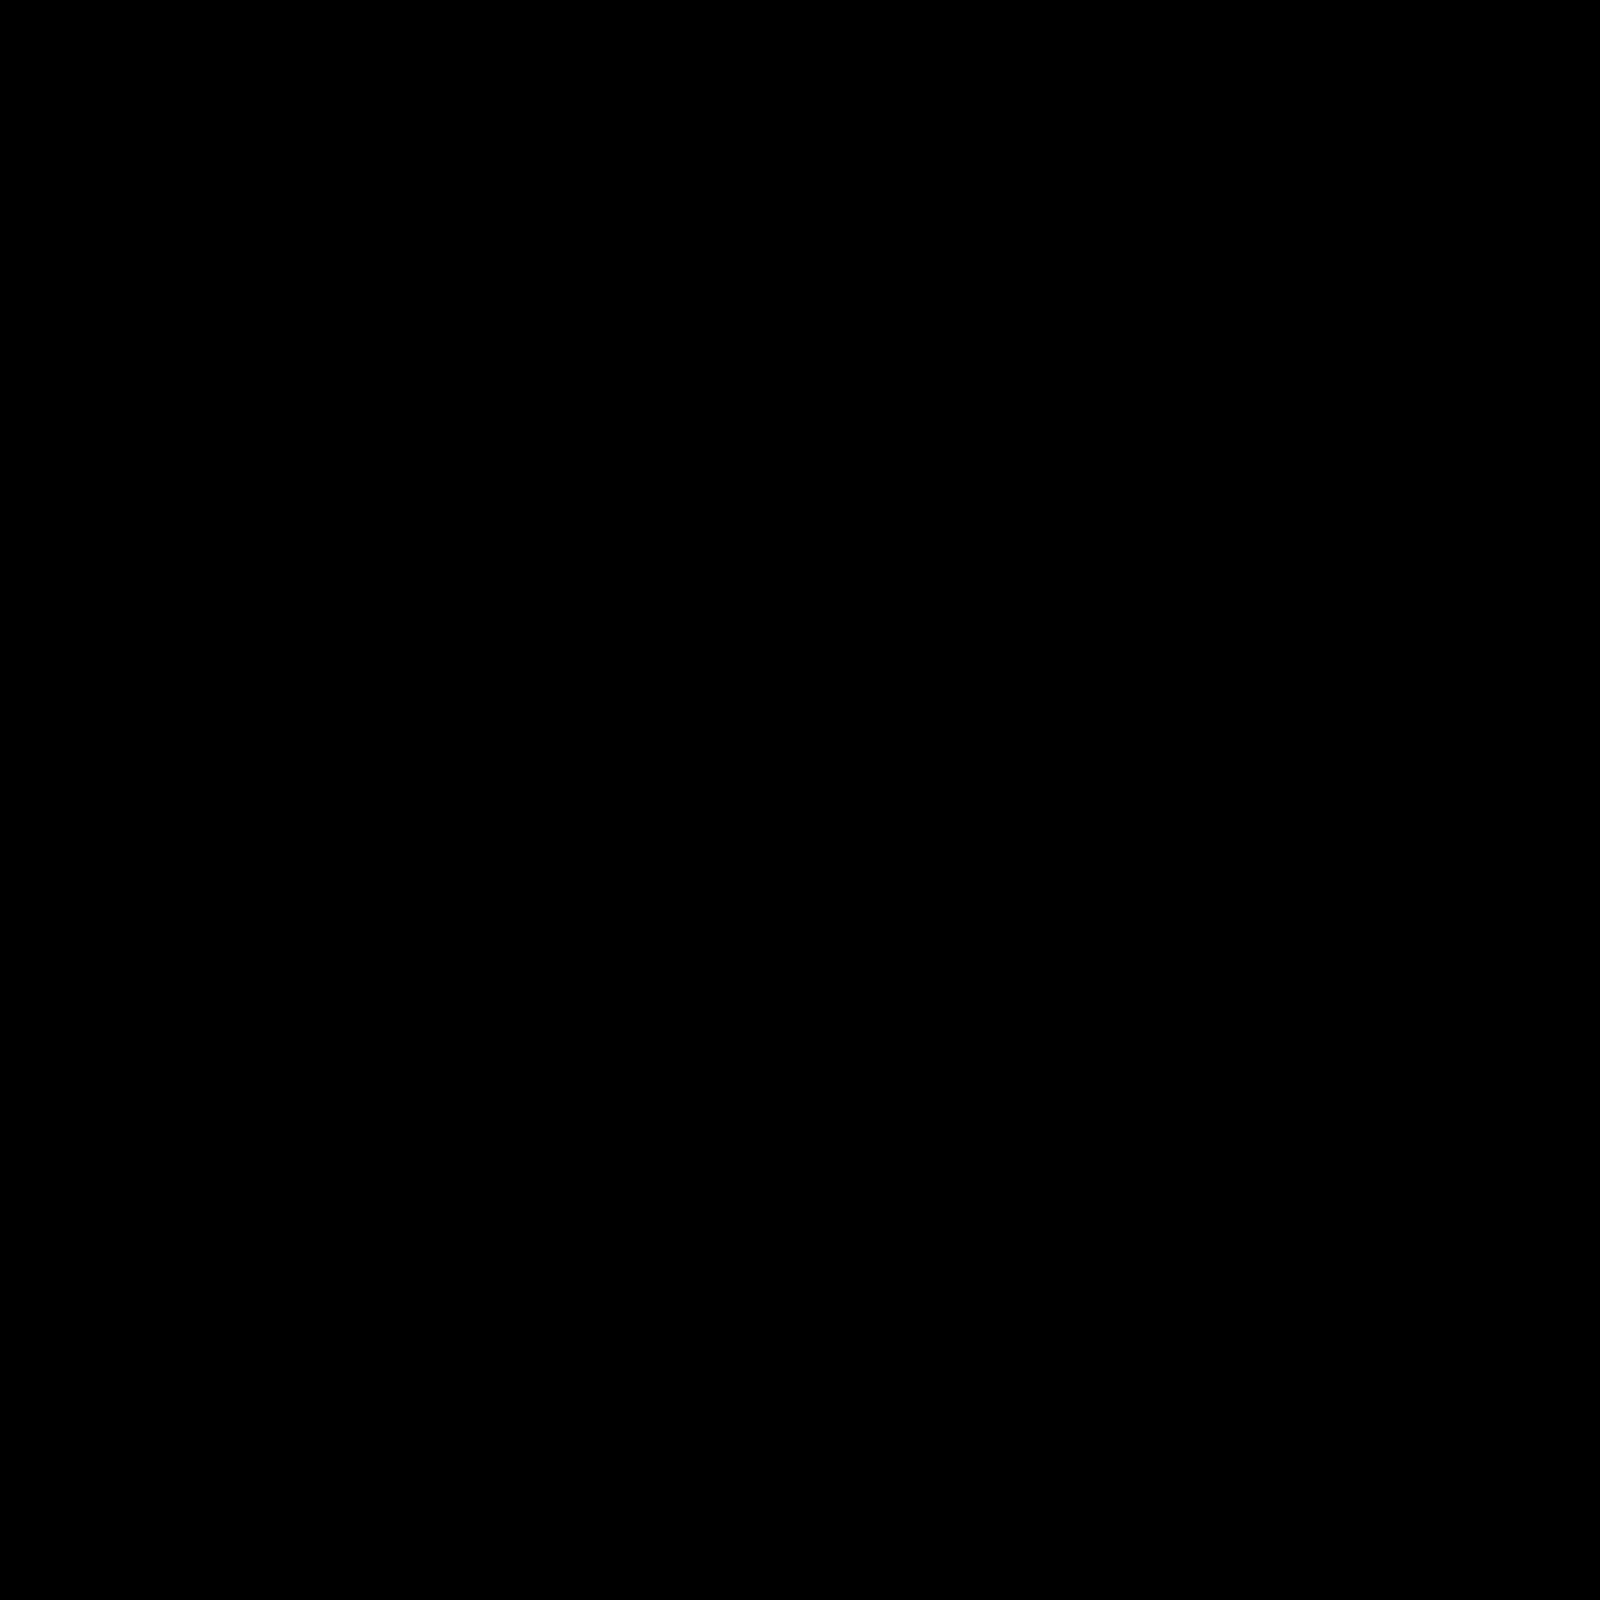 Orienteering Control Flag icon